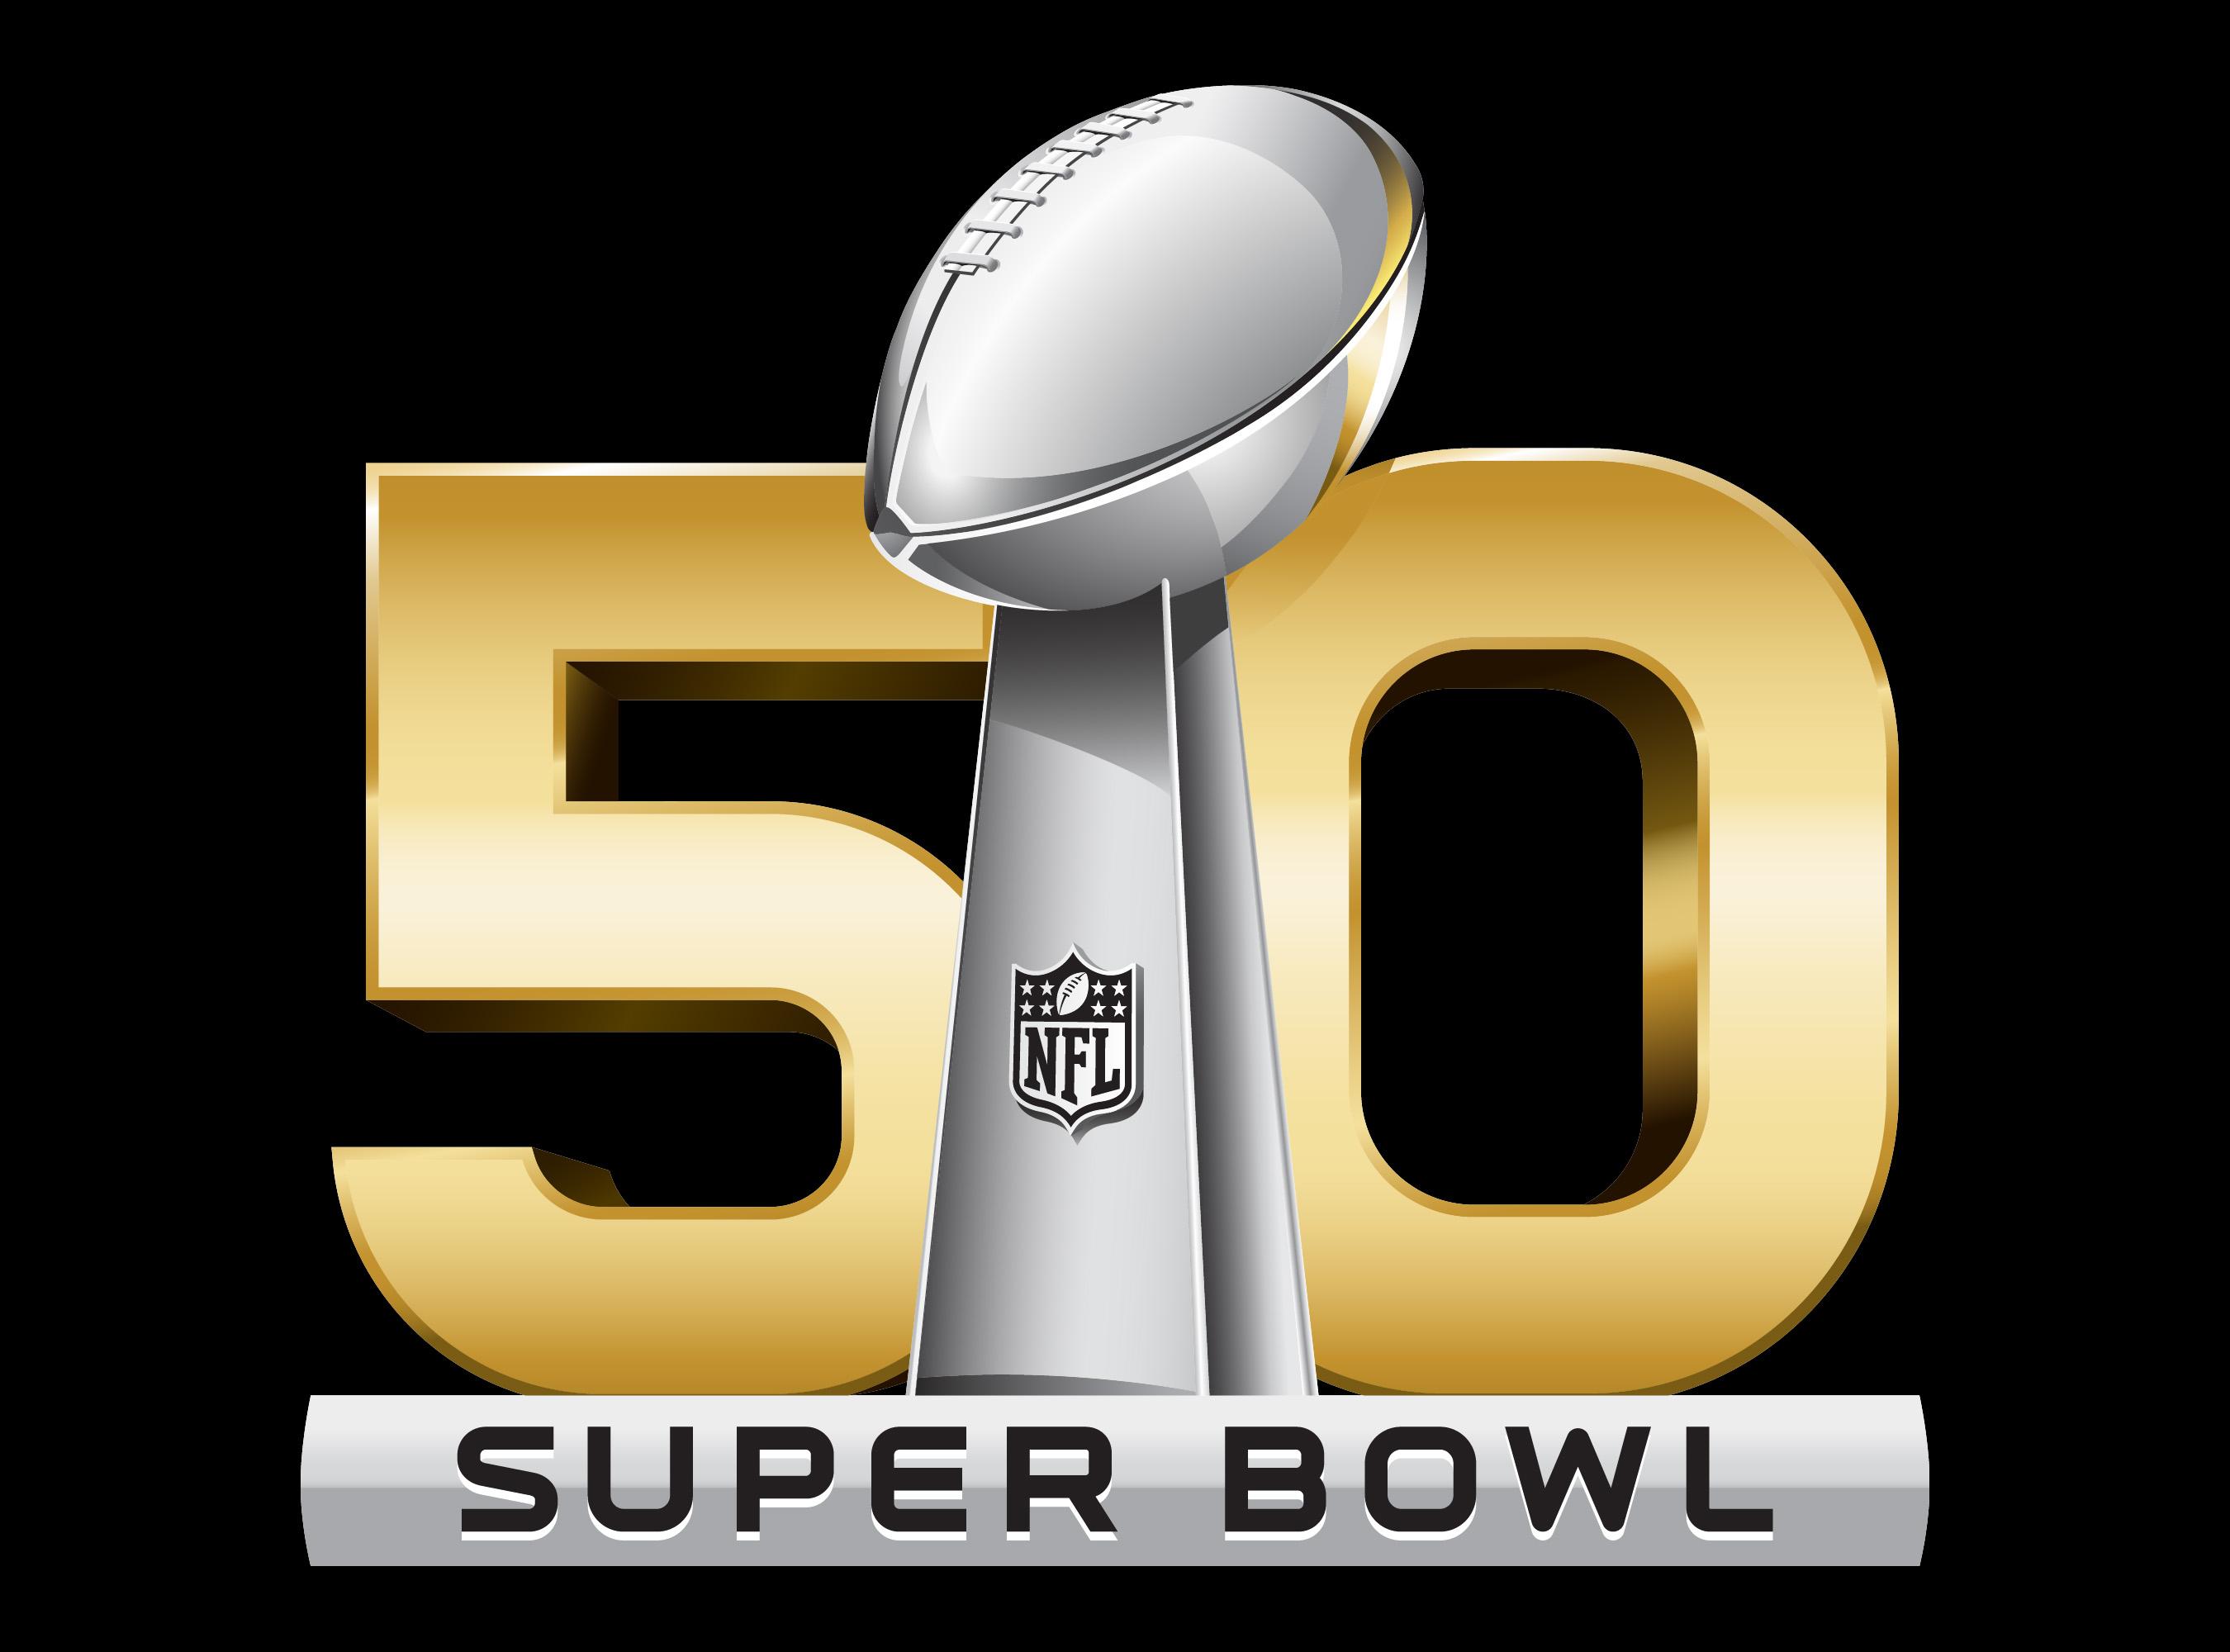 Super bowl 50 logo la super bowl 50 symbol meaning history and symbol super bowl 50 biocorpaavc